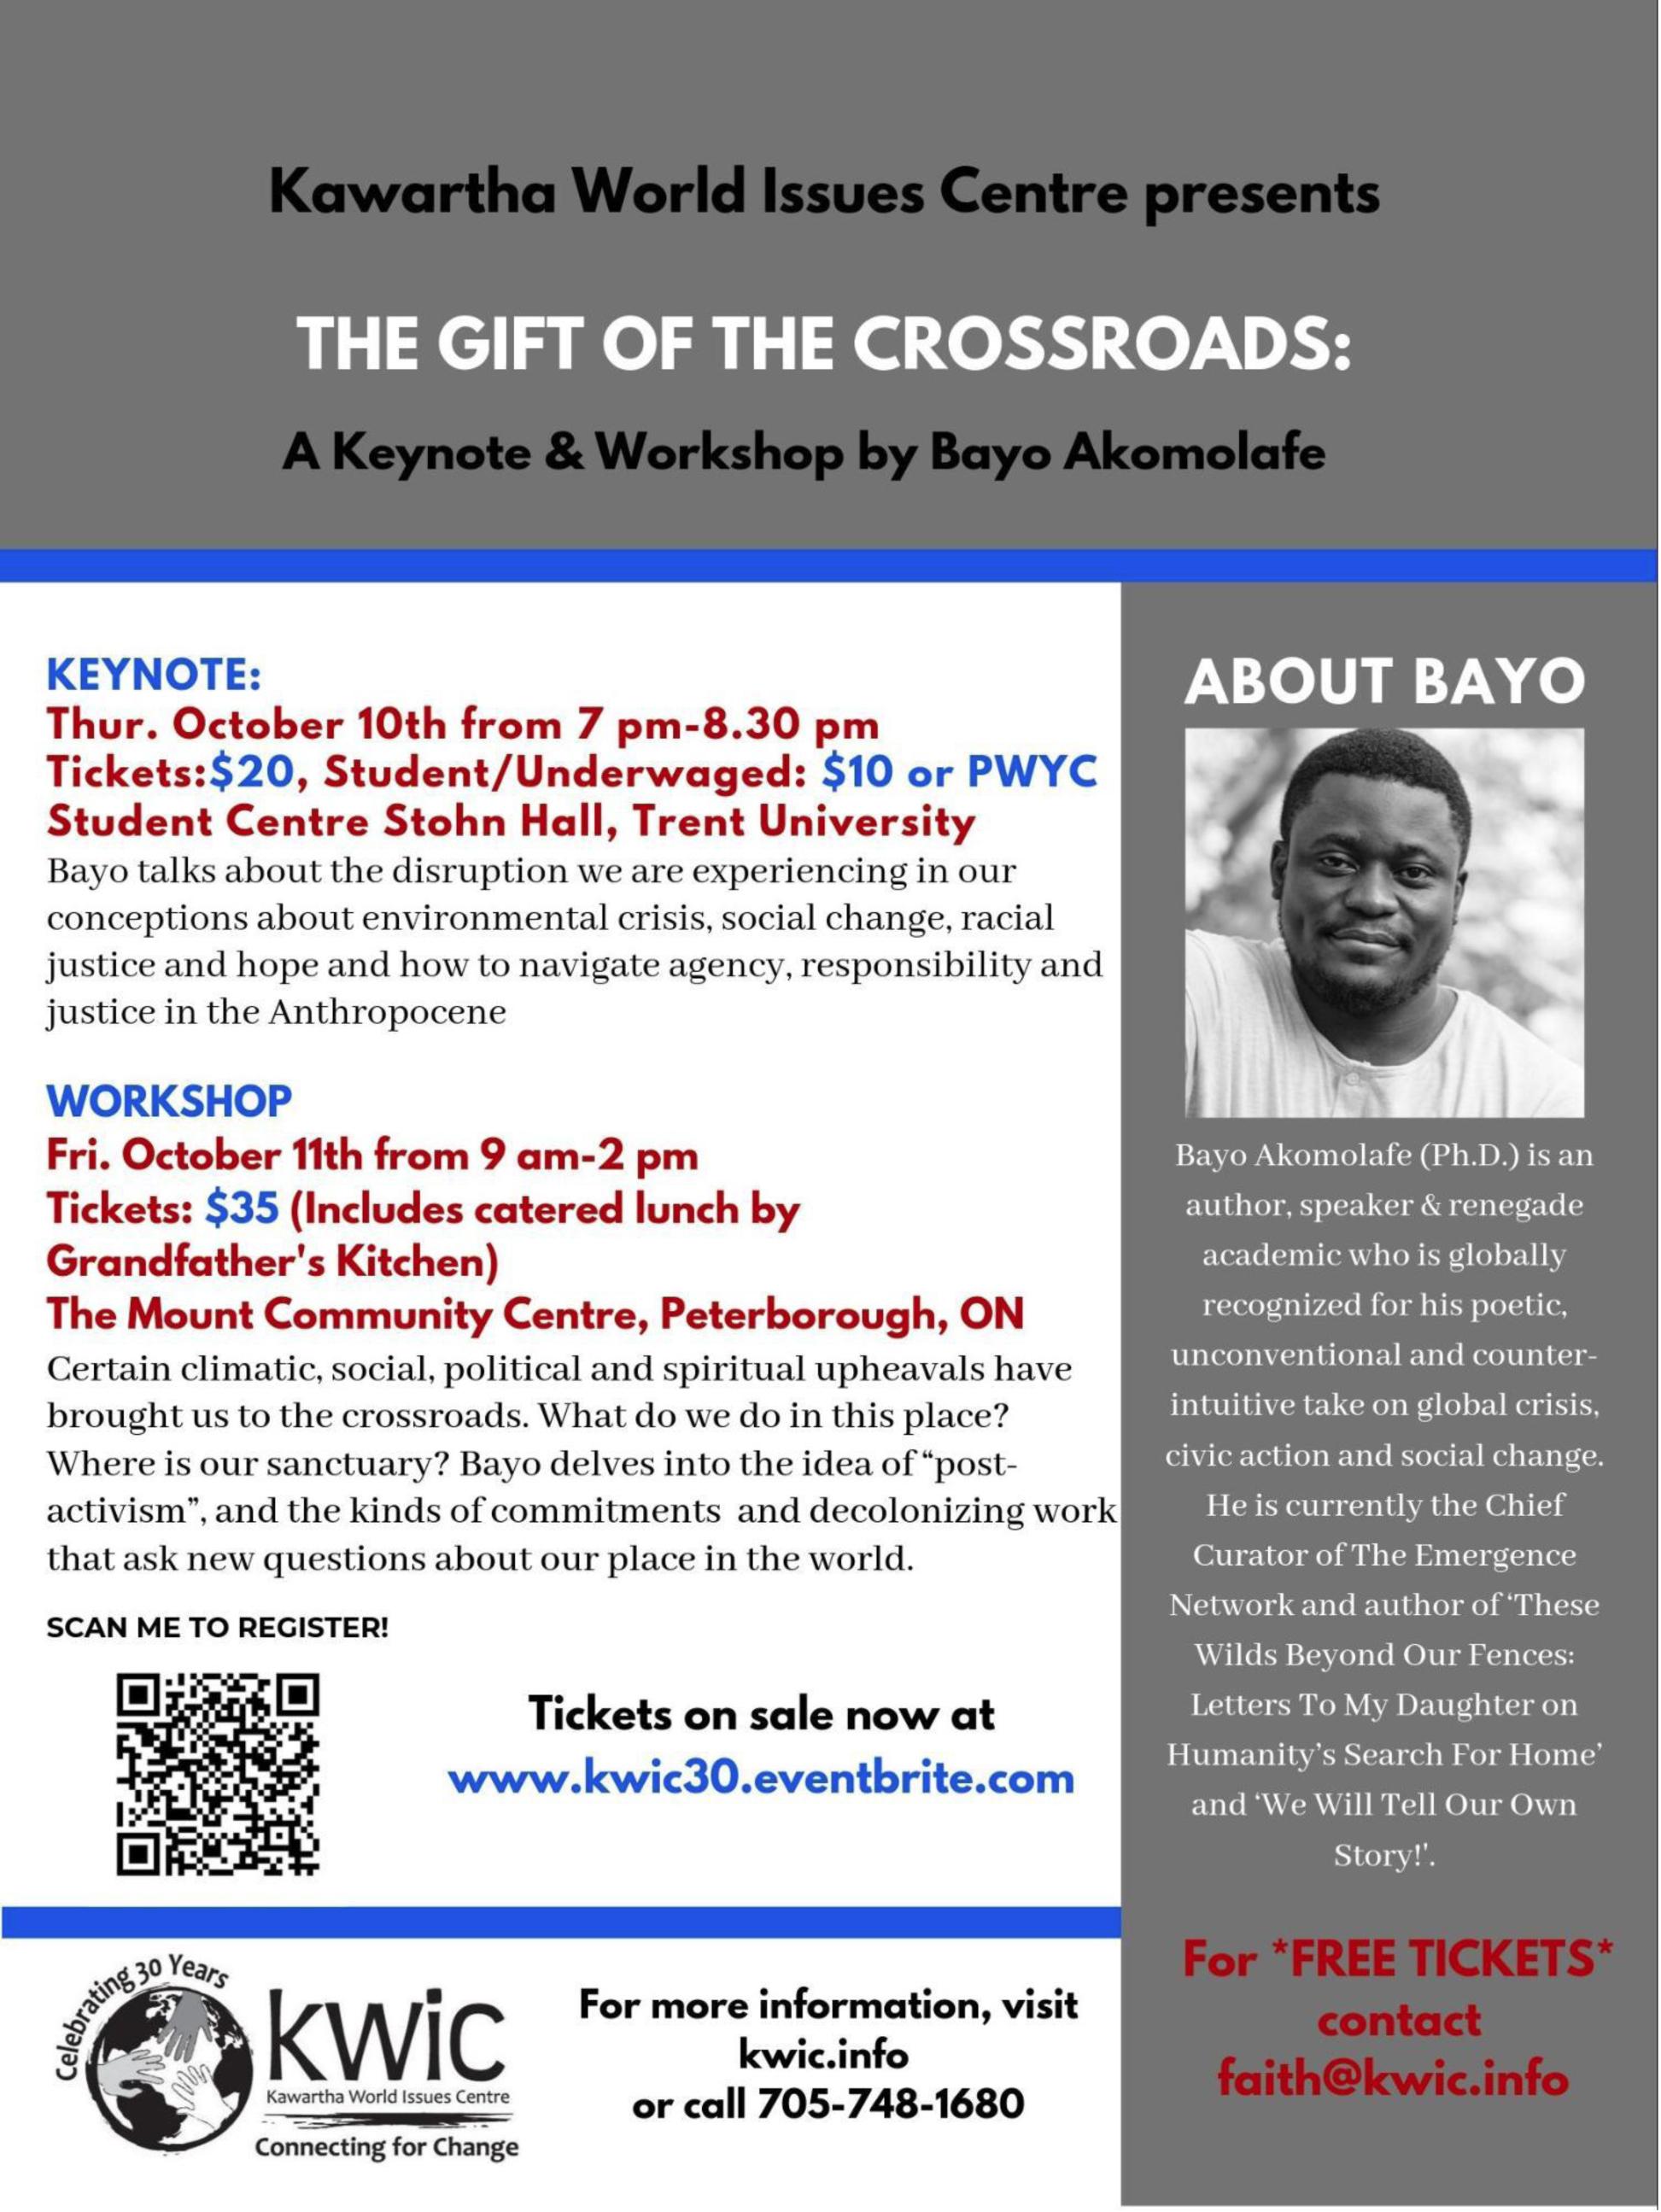 The Entangled Crossroads of Bayo Akomolafe